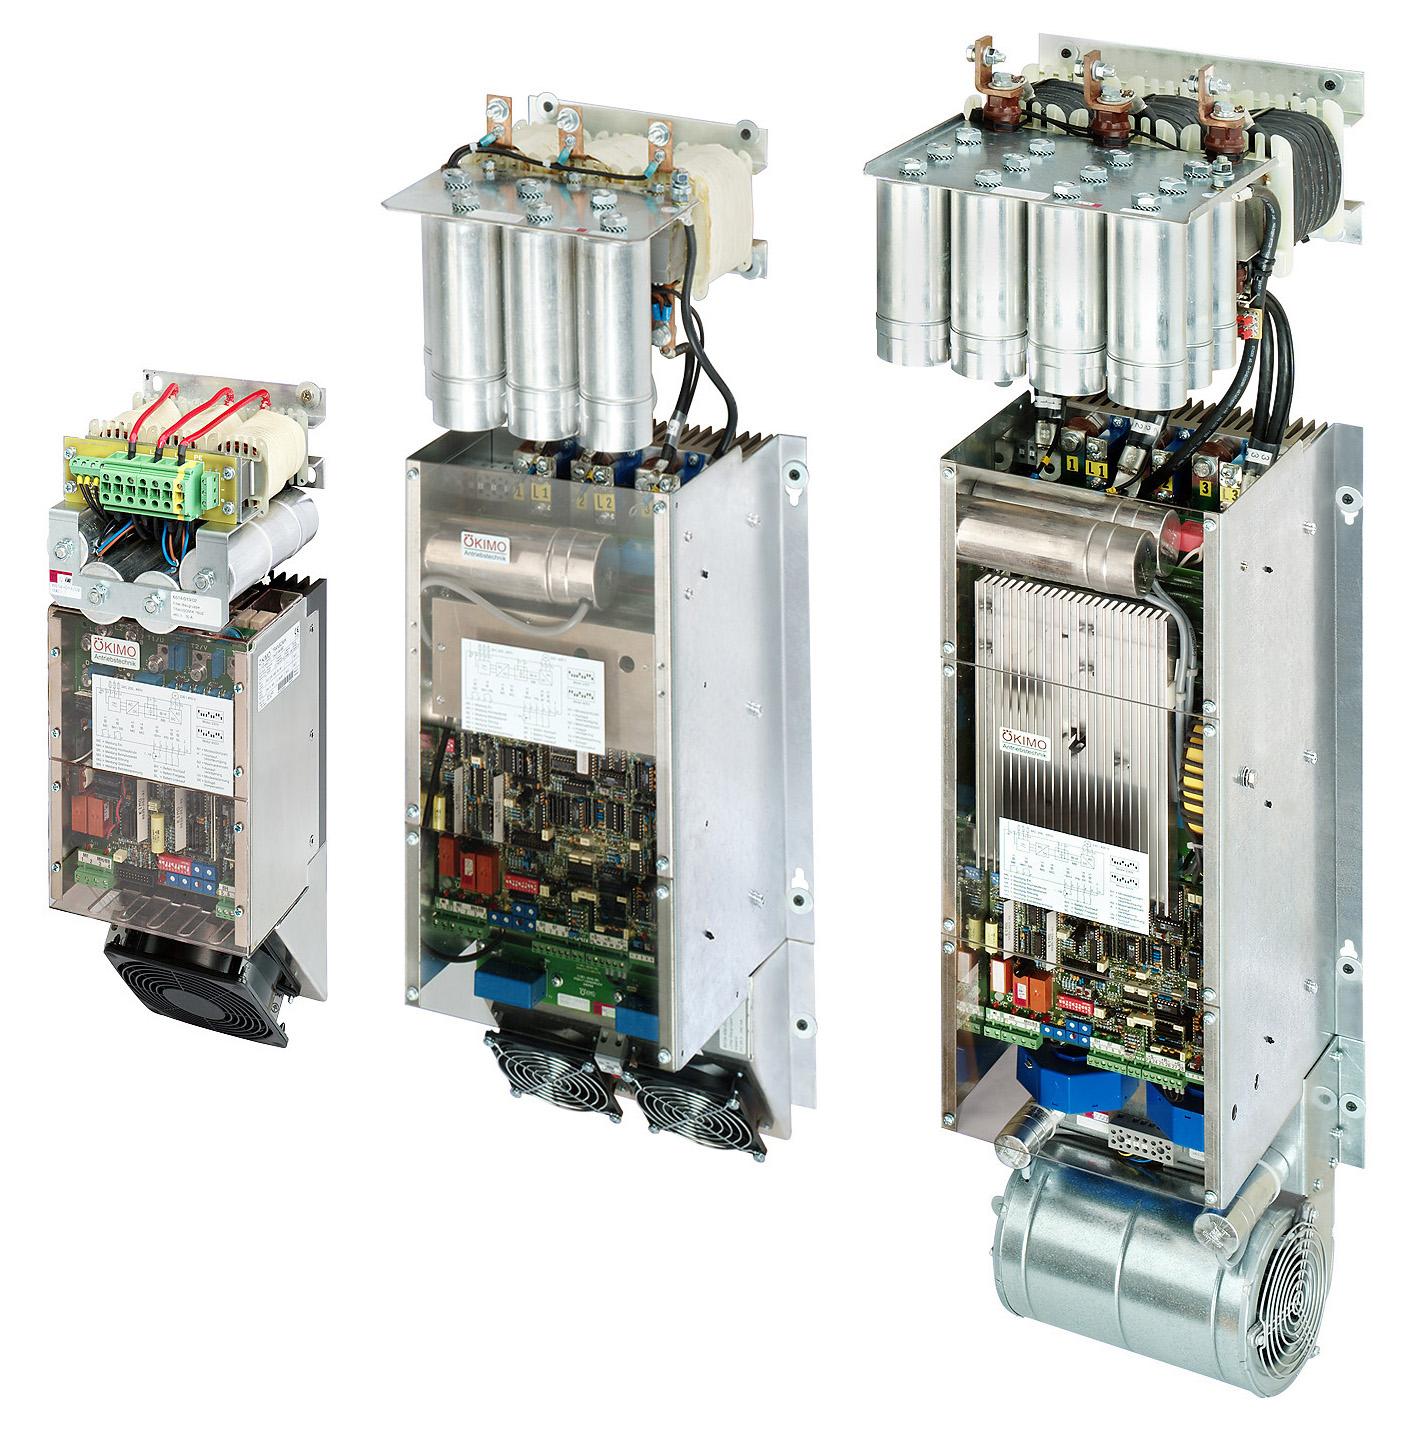 abb vfd panel wiring diagram lutron maestro 3 way dimmer adjustable speed drive wikipedia